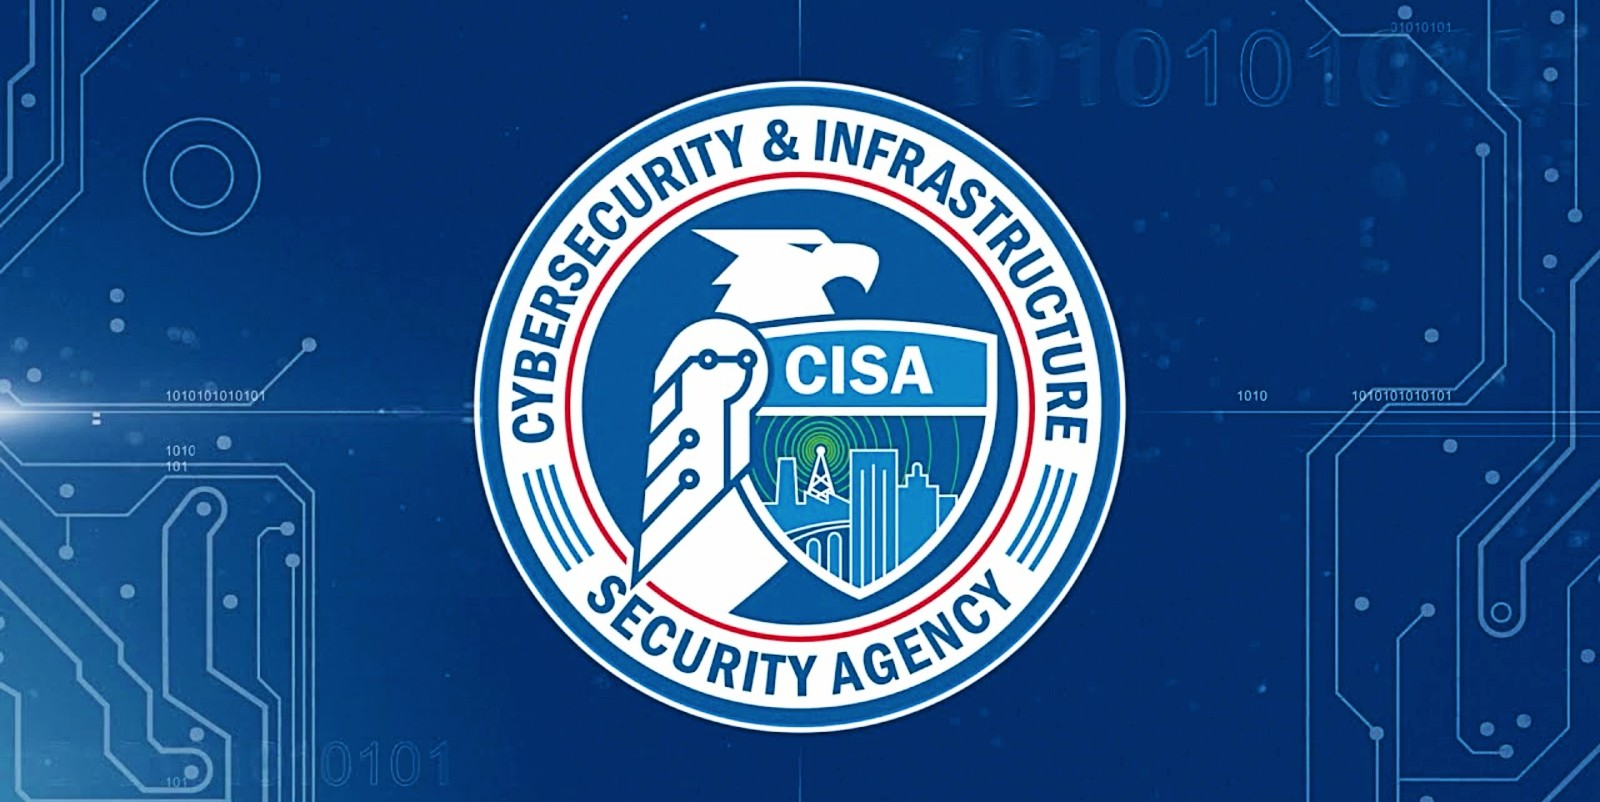 CISA launches vulnerability disclosure platform for federal agencies